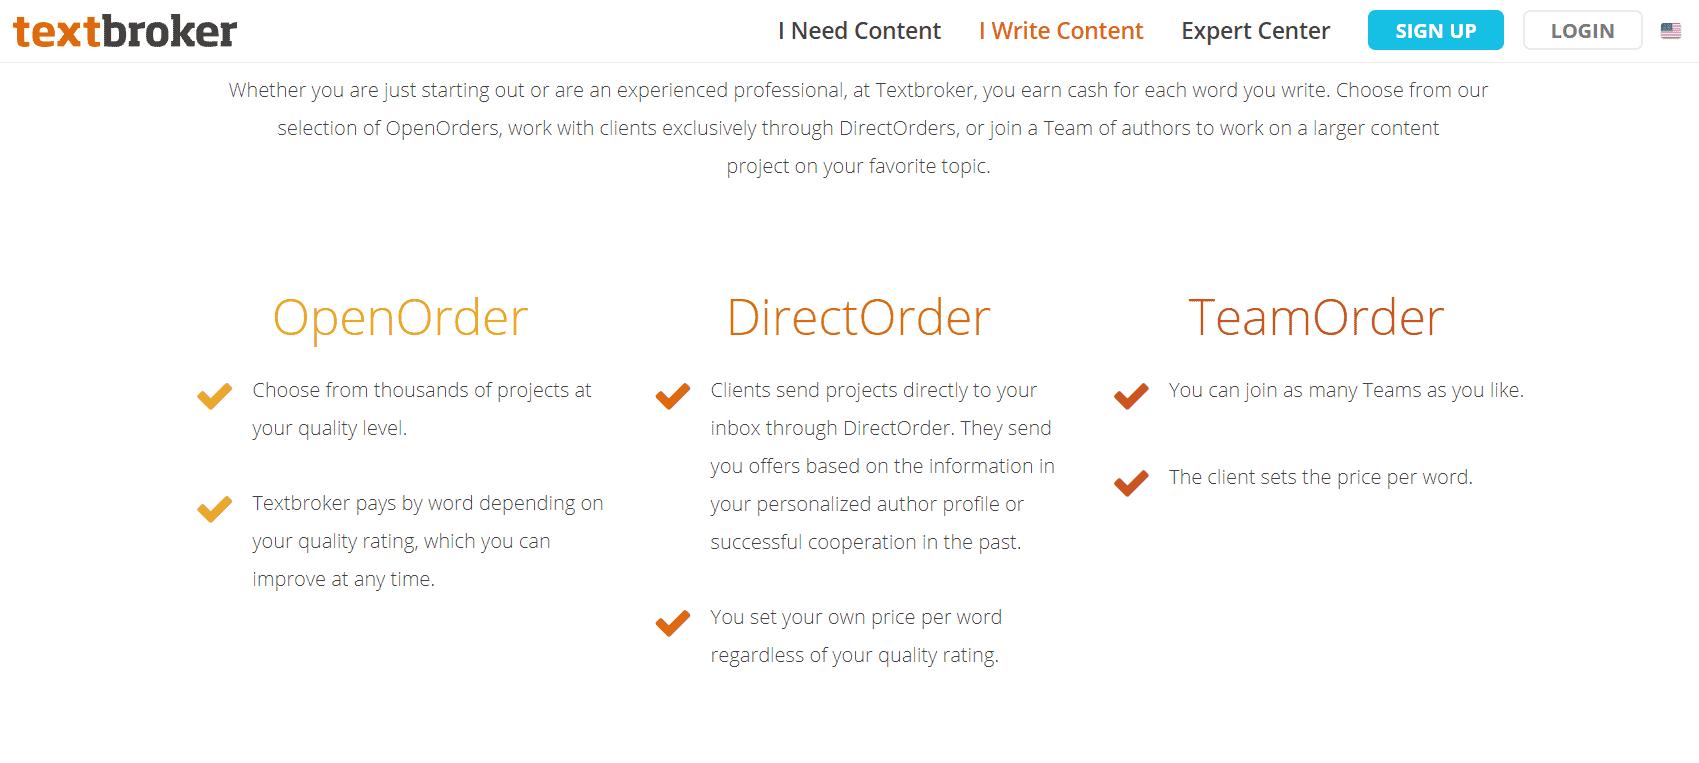 Textbroker Screenshot showing Open, Direct and Team Order options